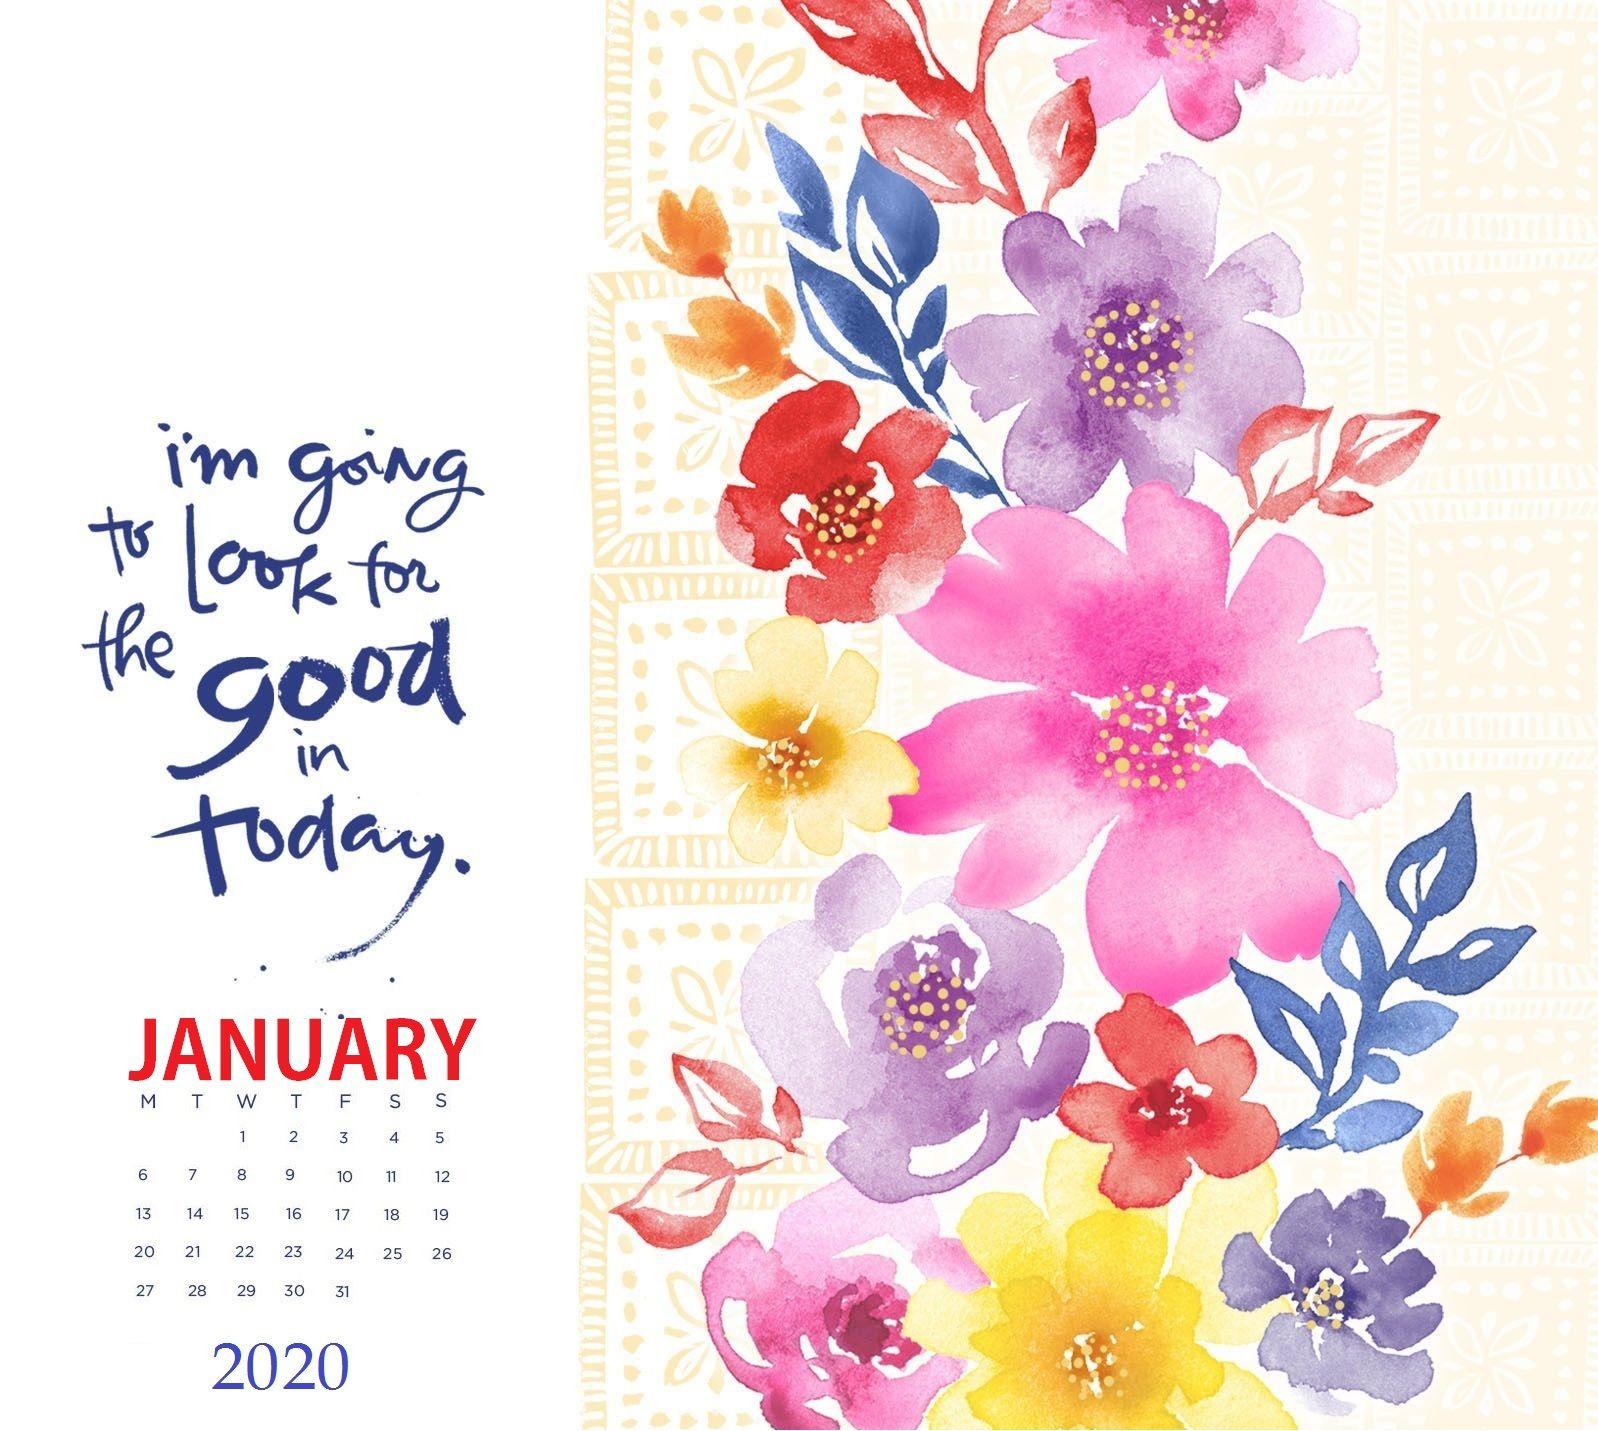 iPhone January 2020 Wallpaper Calendar Calendar design